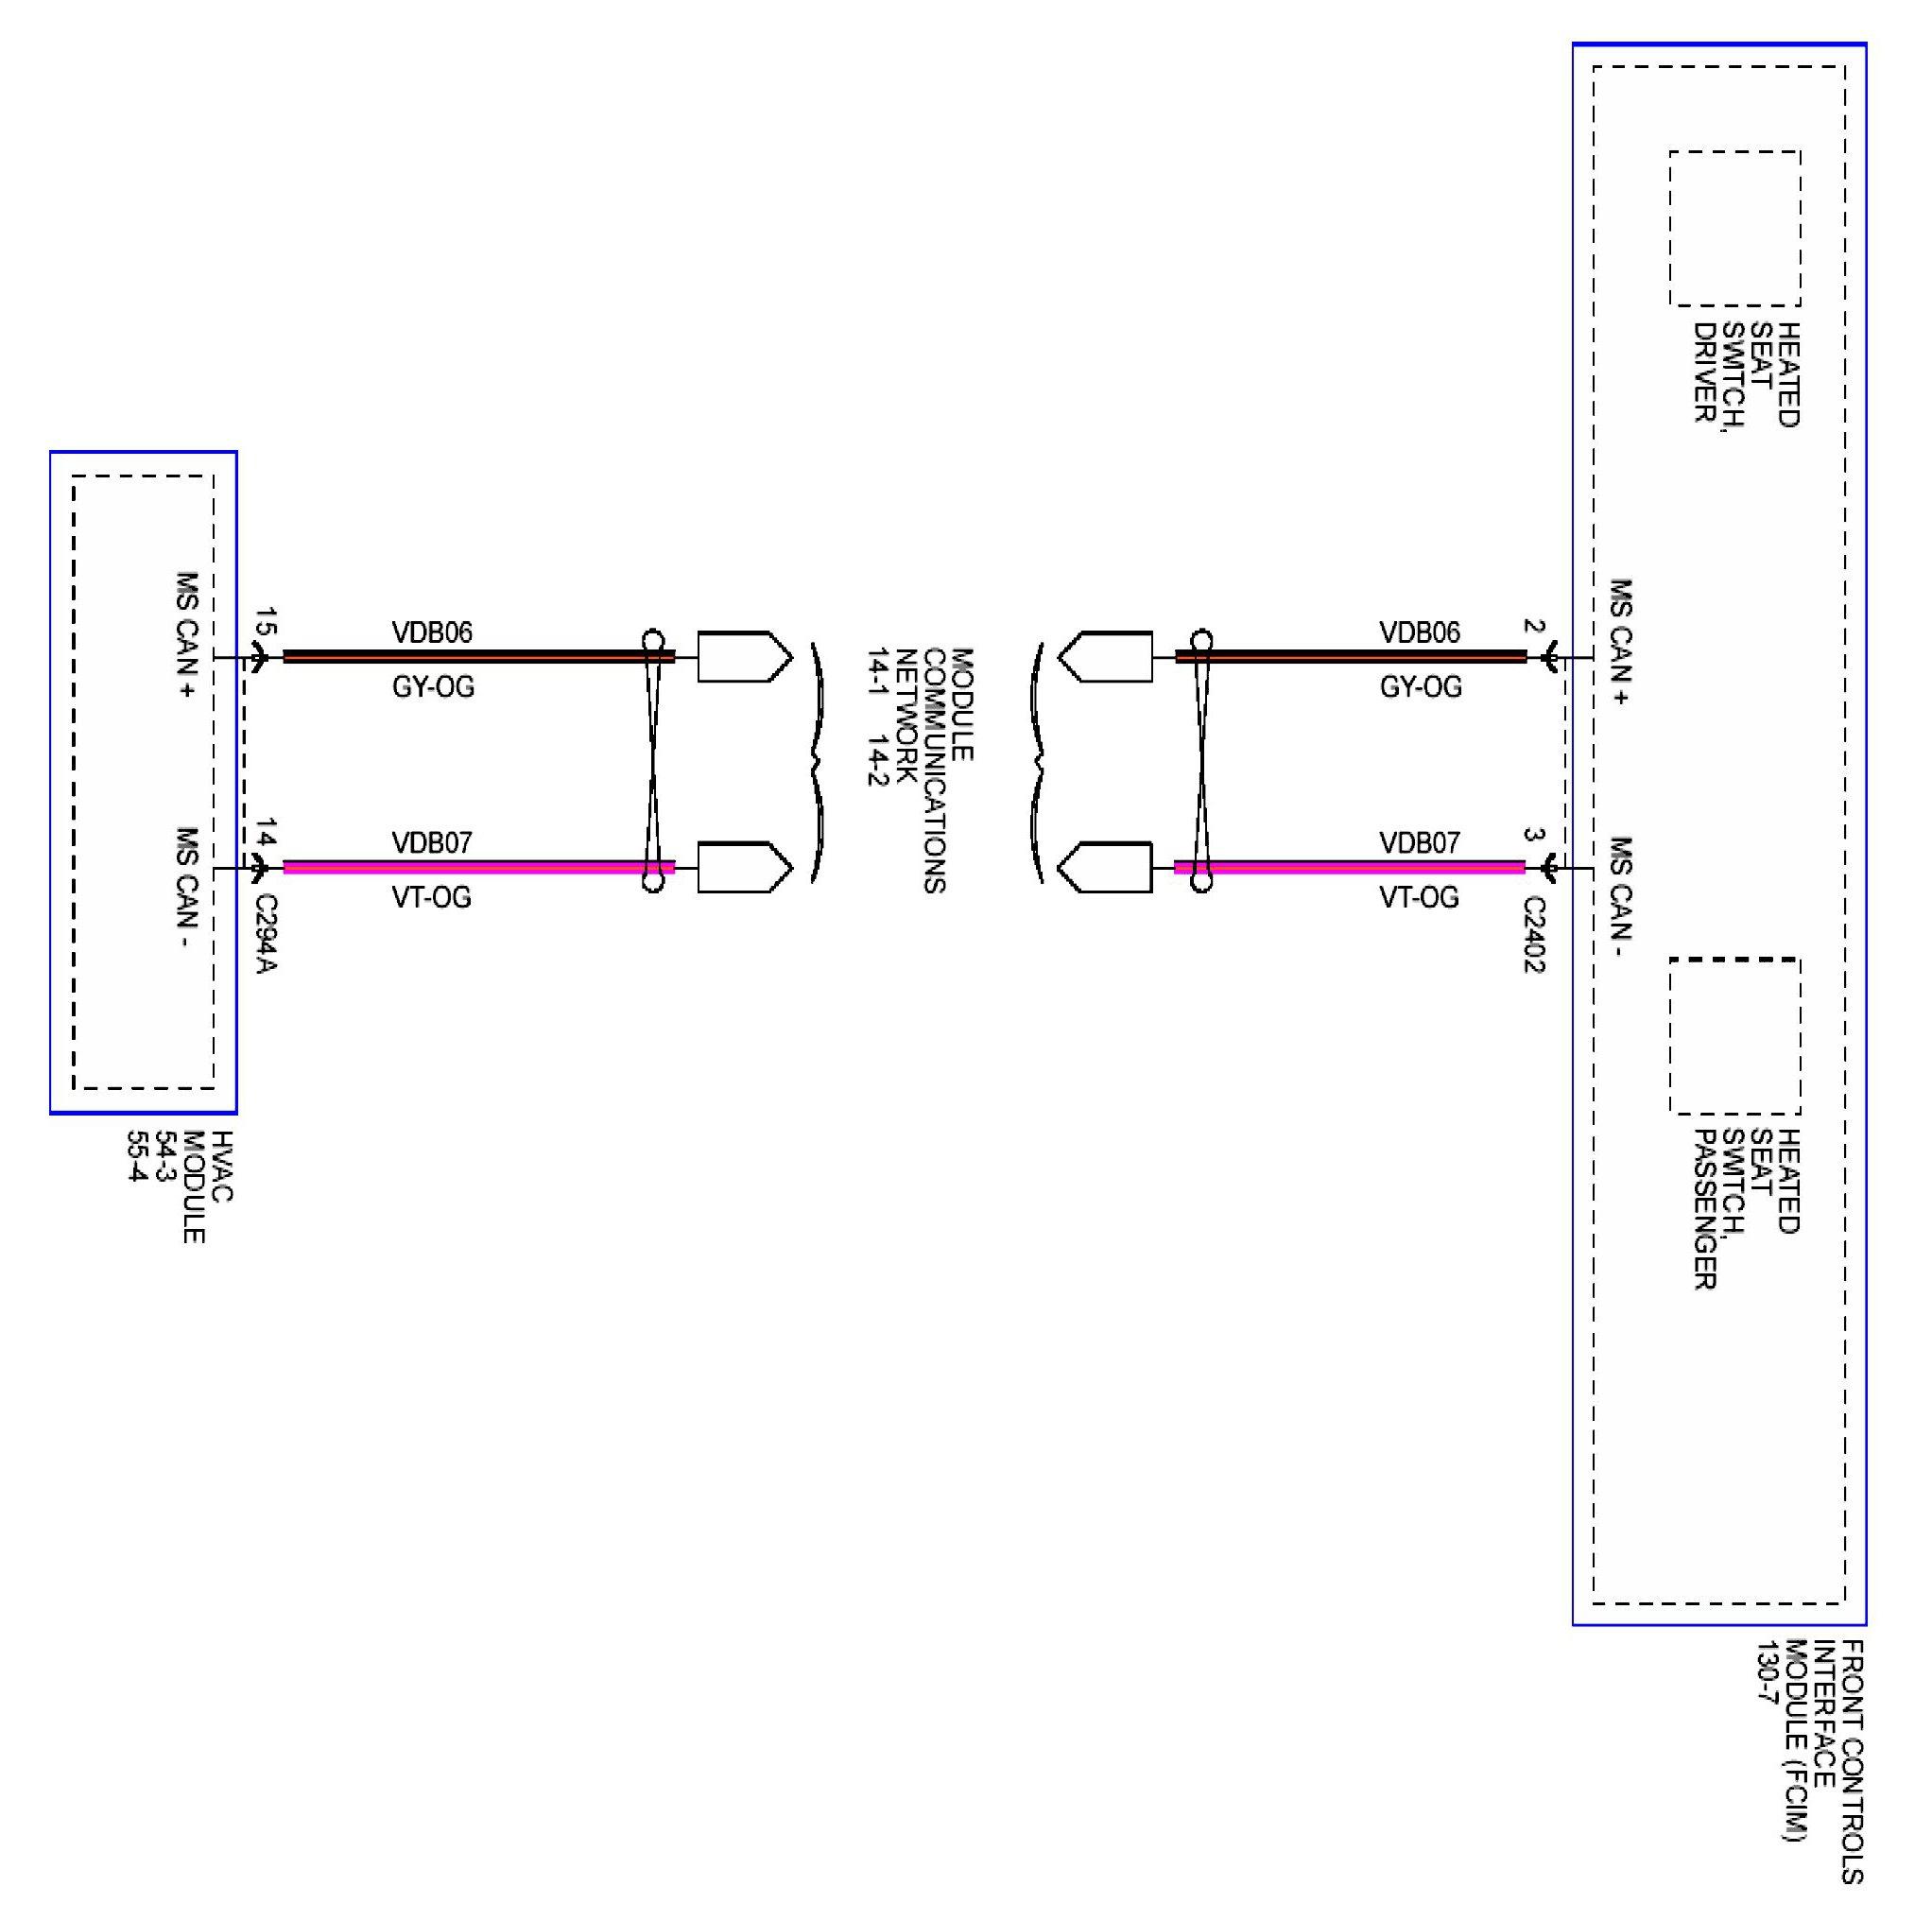 pontiac g8 stereo wiring diagram 2001 saturn sl2 starter trans sport